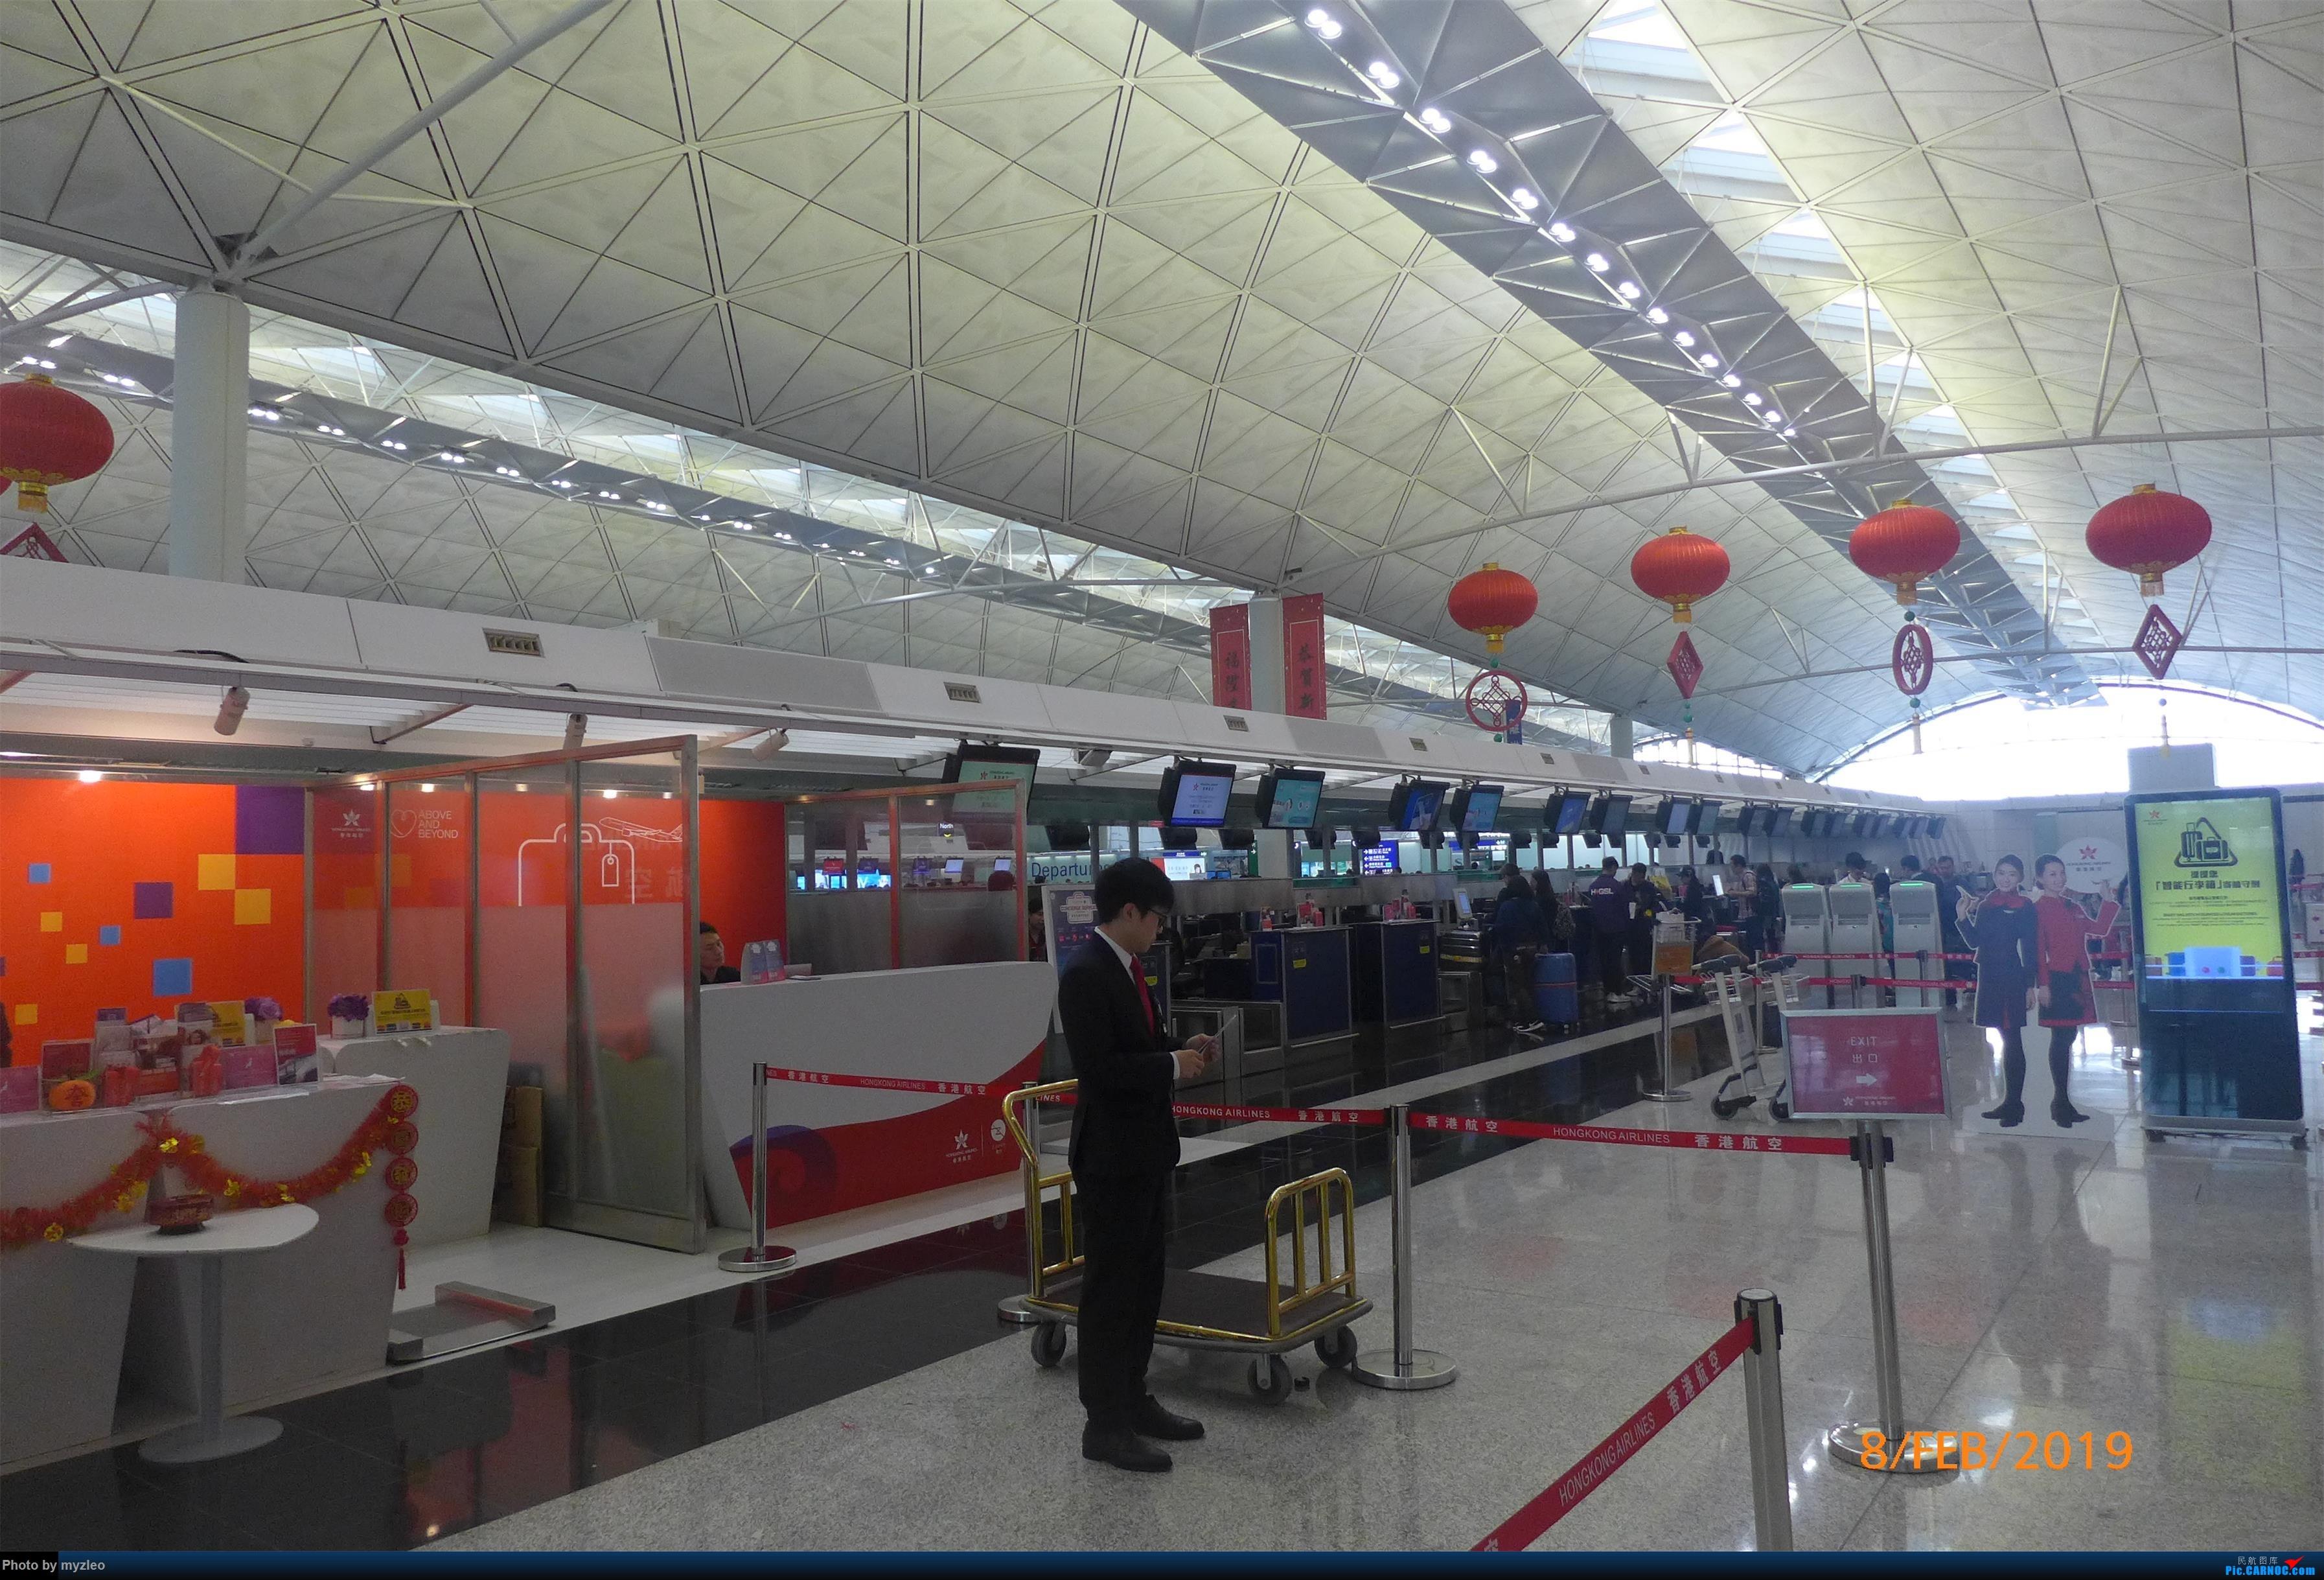 Re:[原创]【myzleo的游记4.5】十年之约(5)在香港的最后一天,搭乘港航333回沪    中国香港国际机场